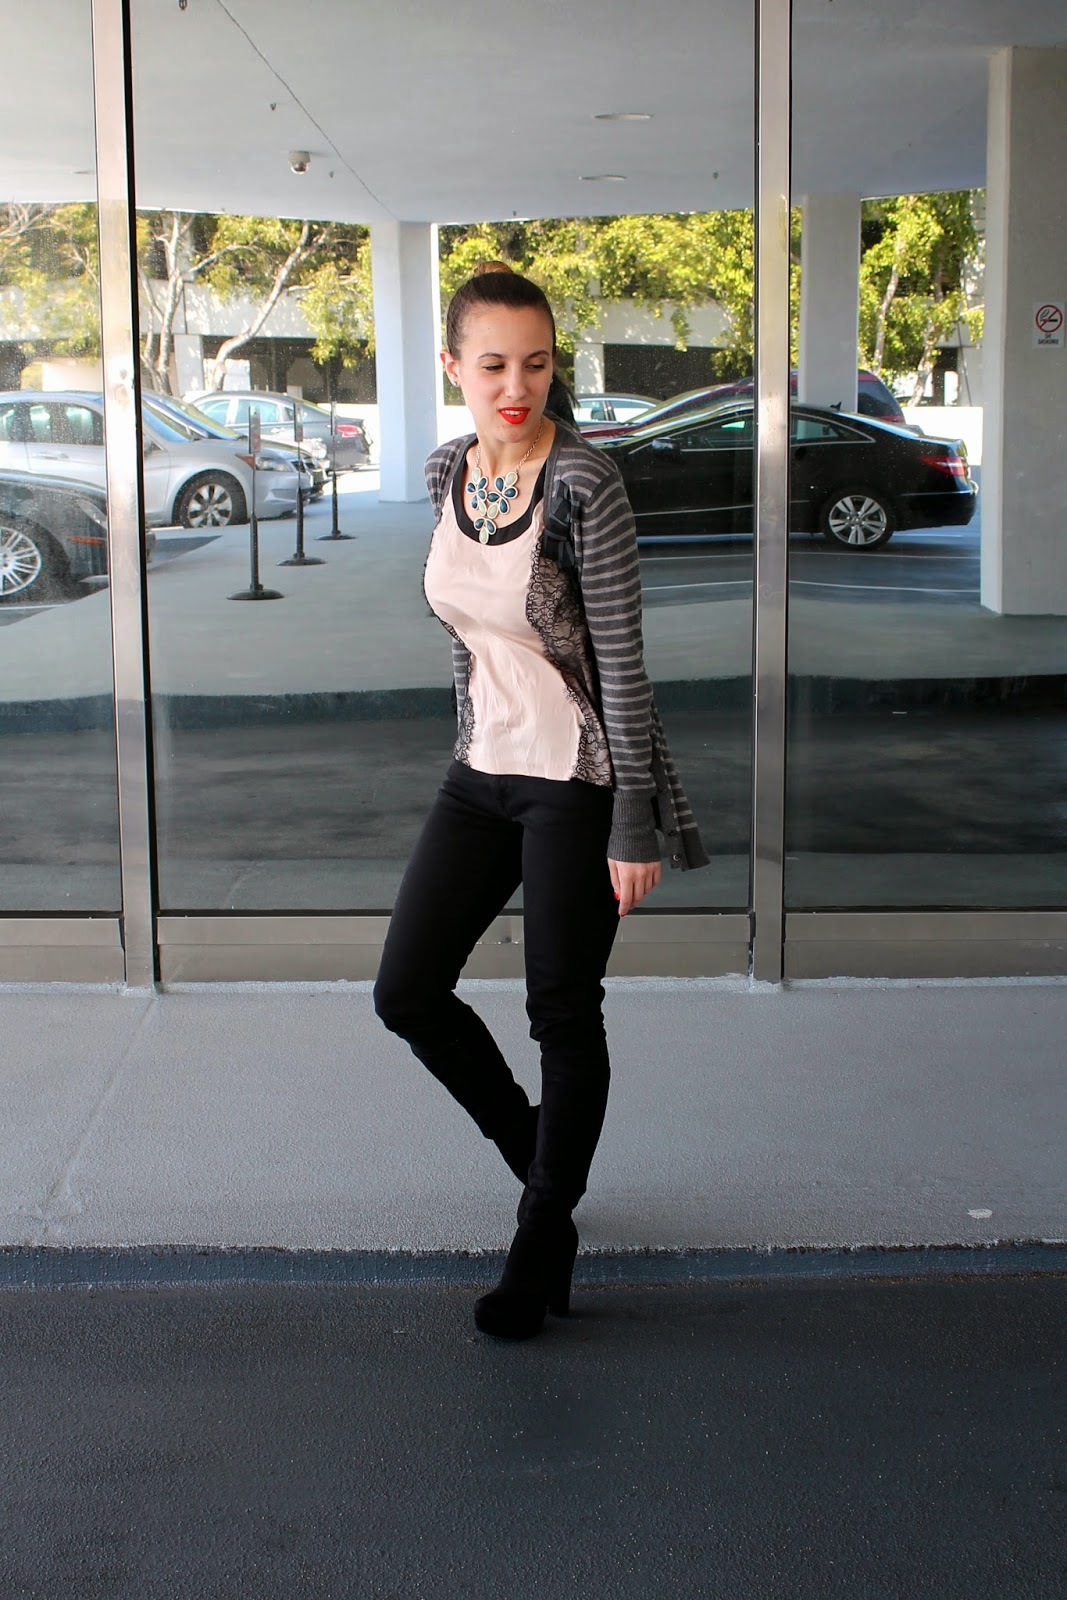 Nordstrom, White House Black Market, Levi's, LOFT, stripes, prep, edgy, Miami fashion, ootd, lace